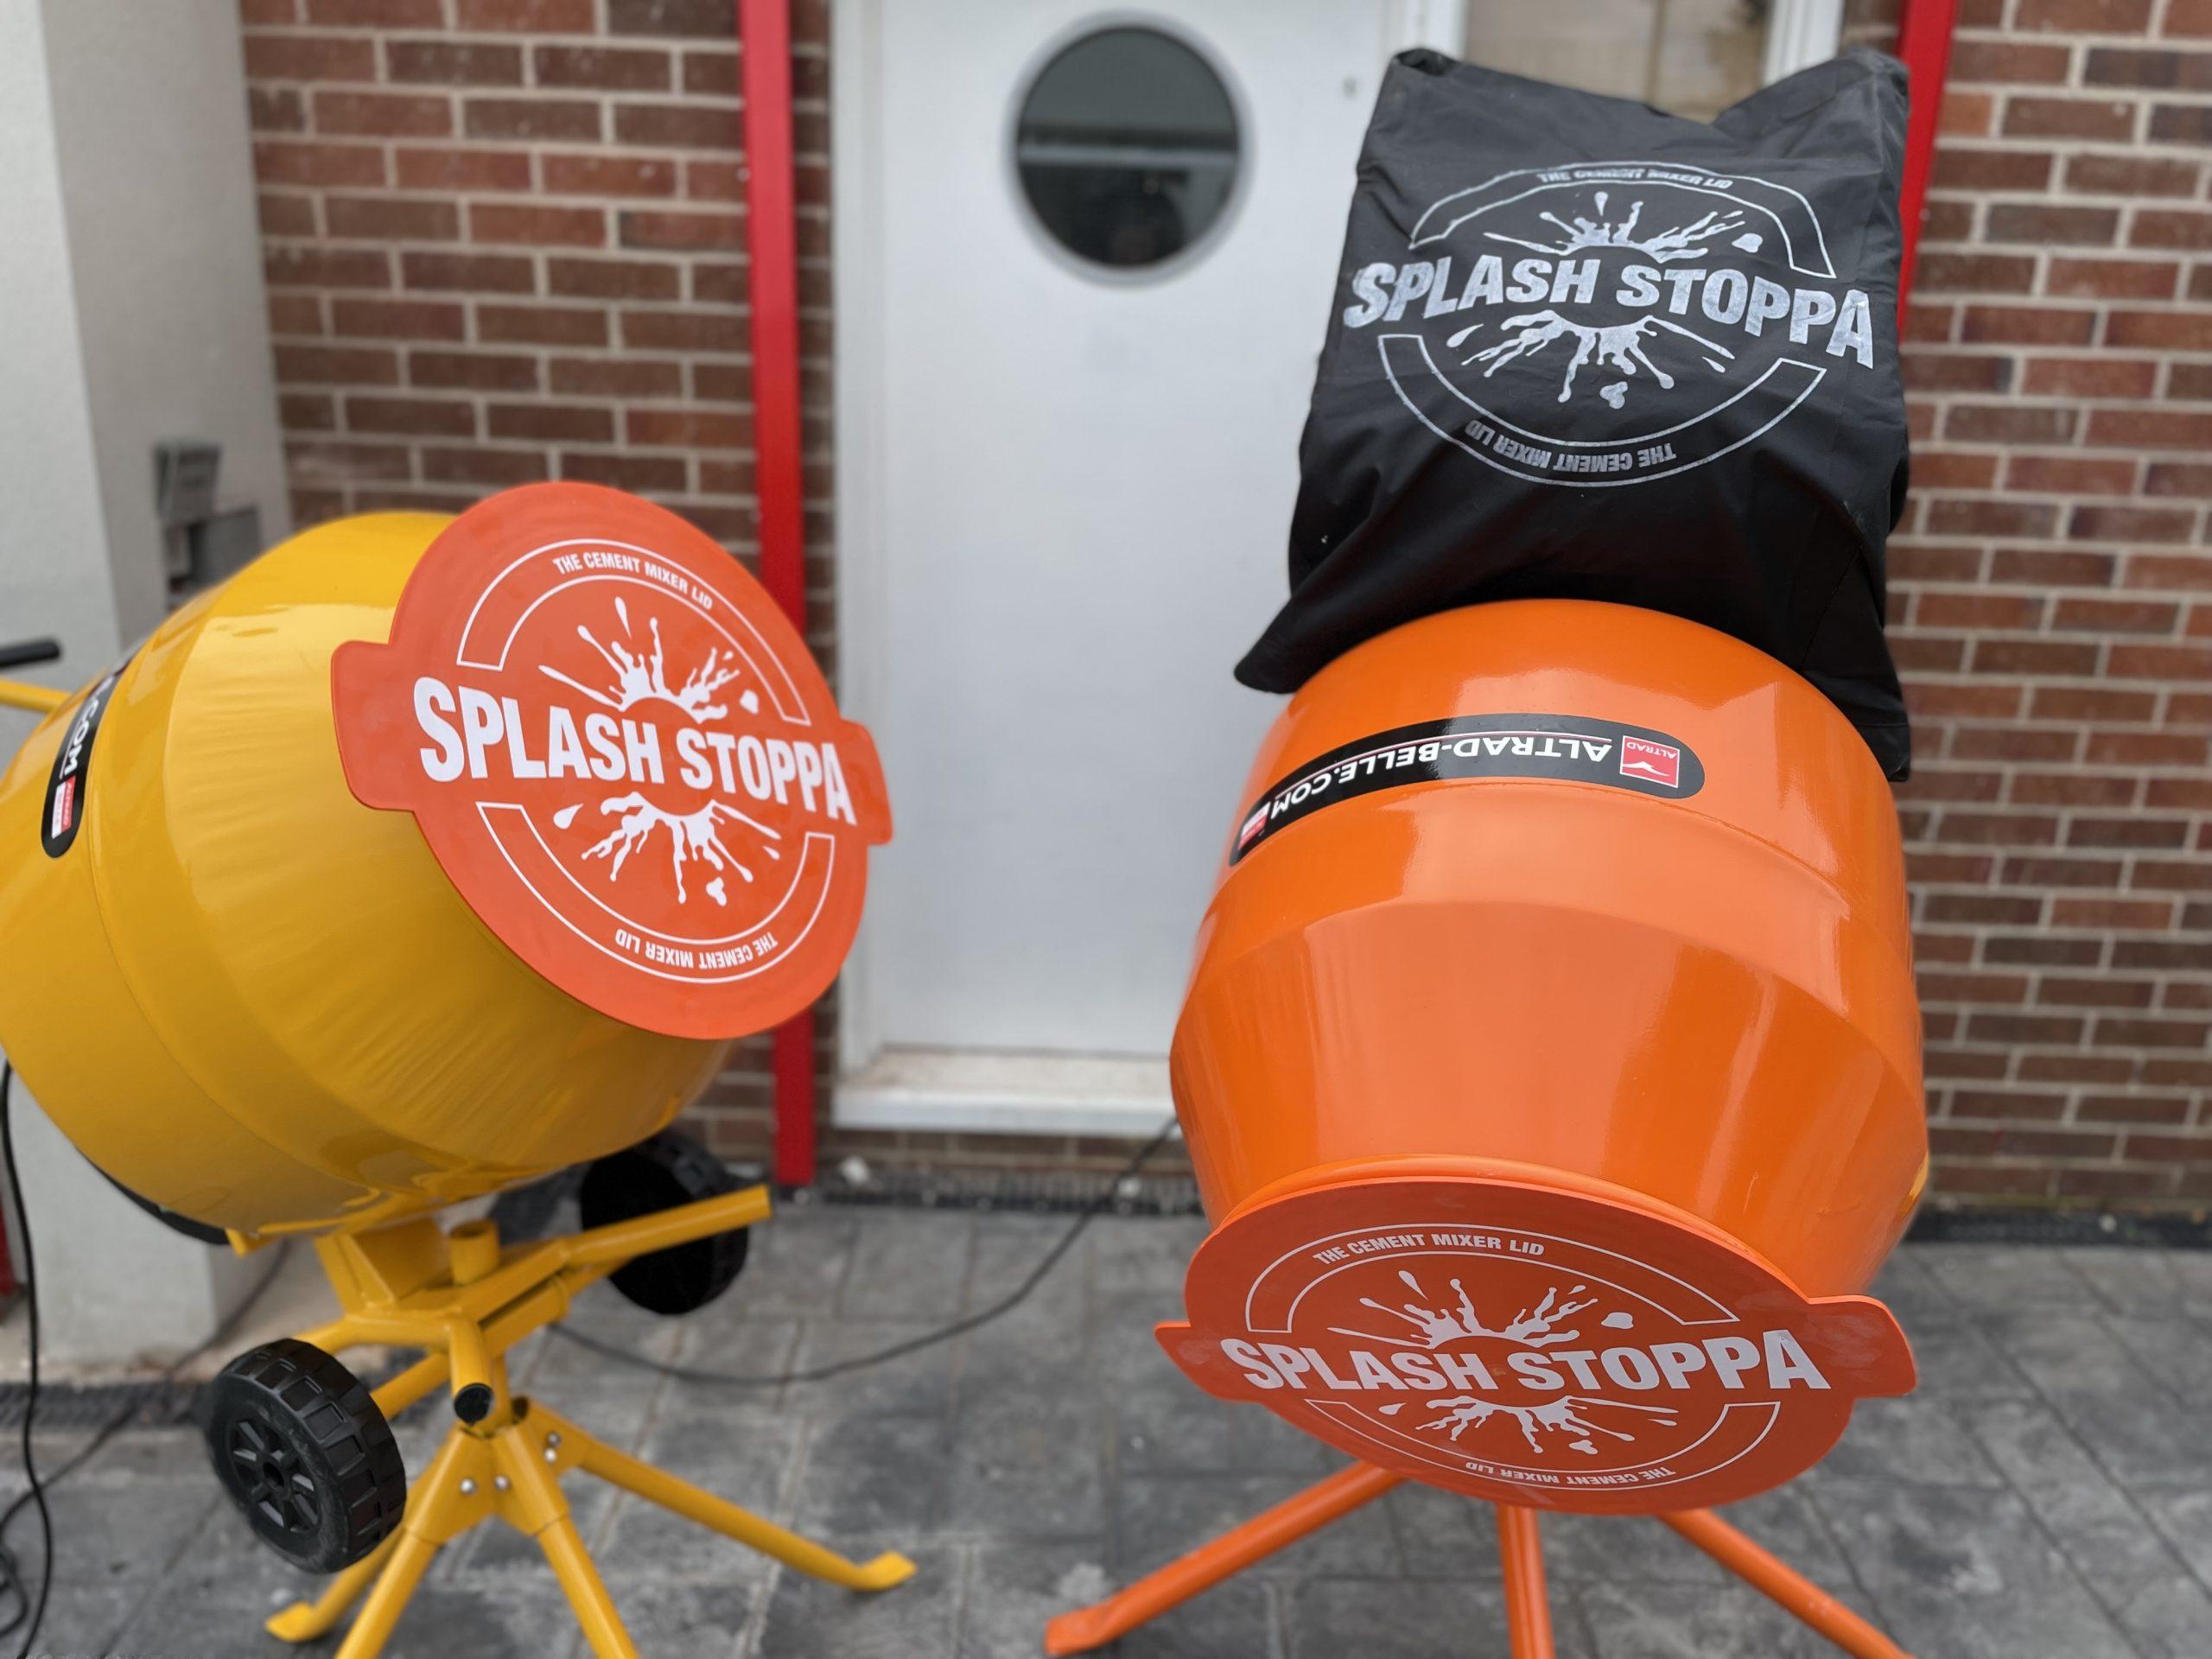 Cement-Mixer-Lid-Splash-Stopper